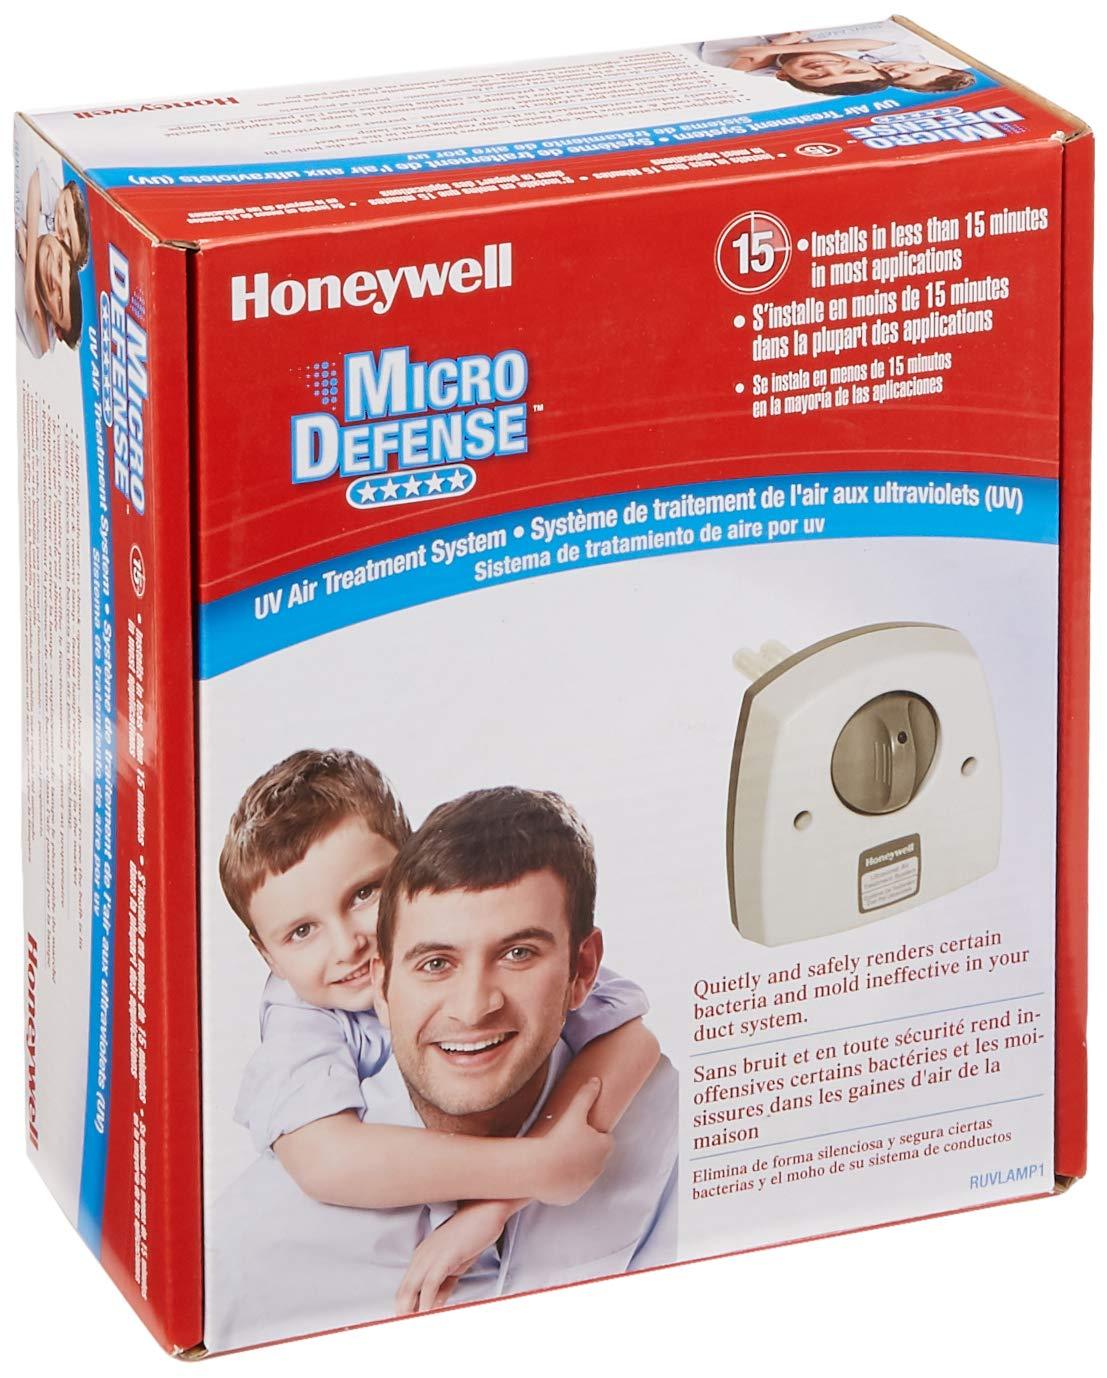 Honeywell RUVLAMP1 Air Treatment System